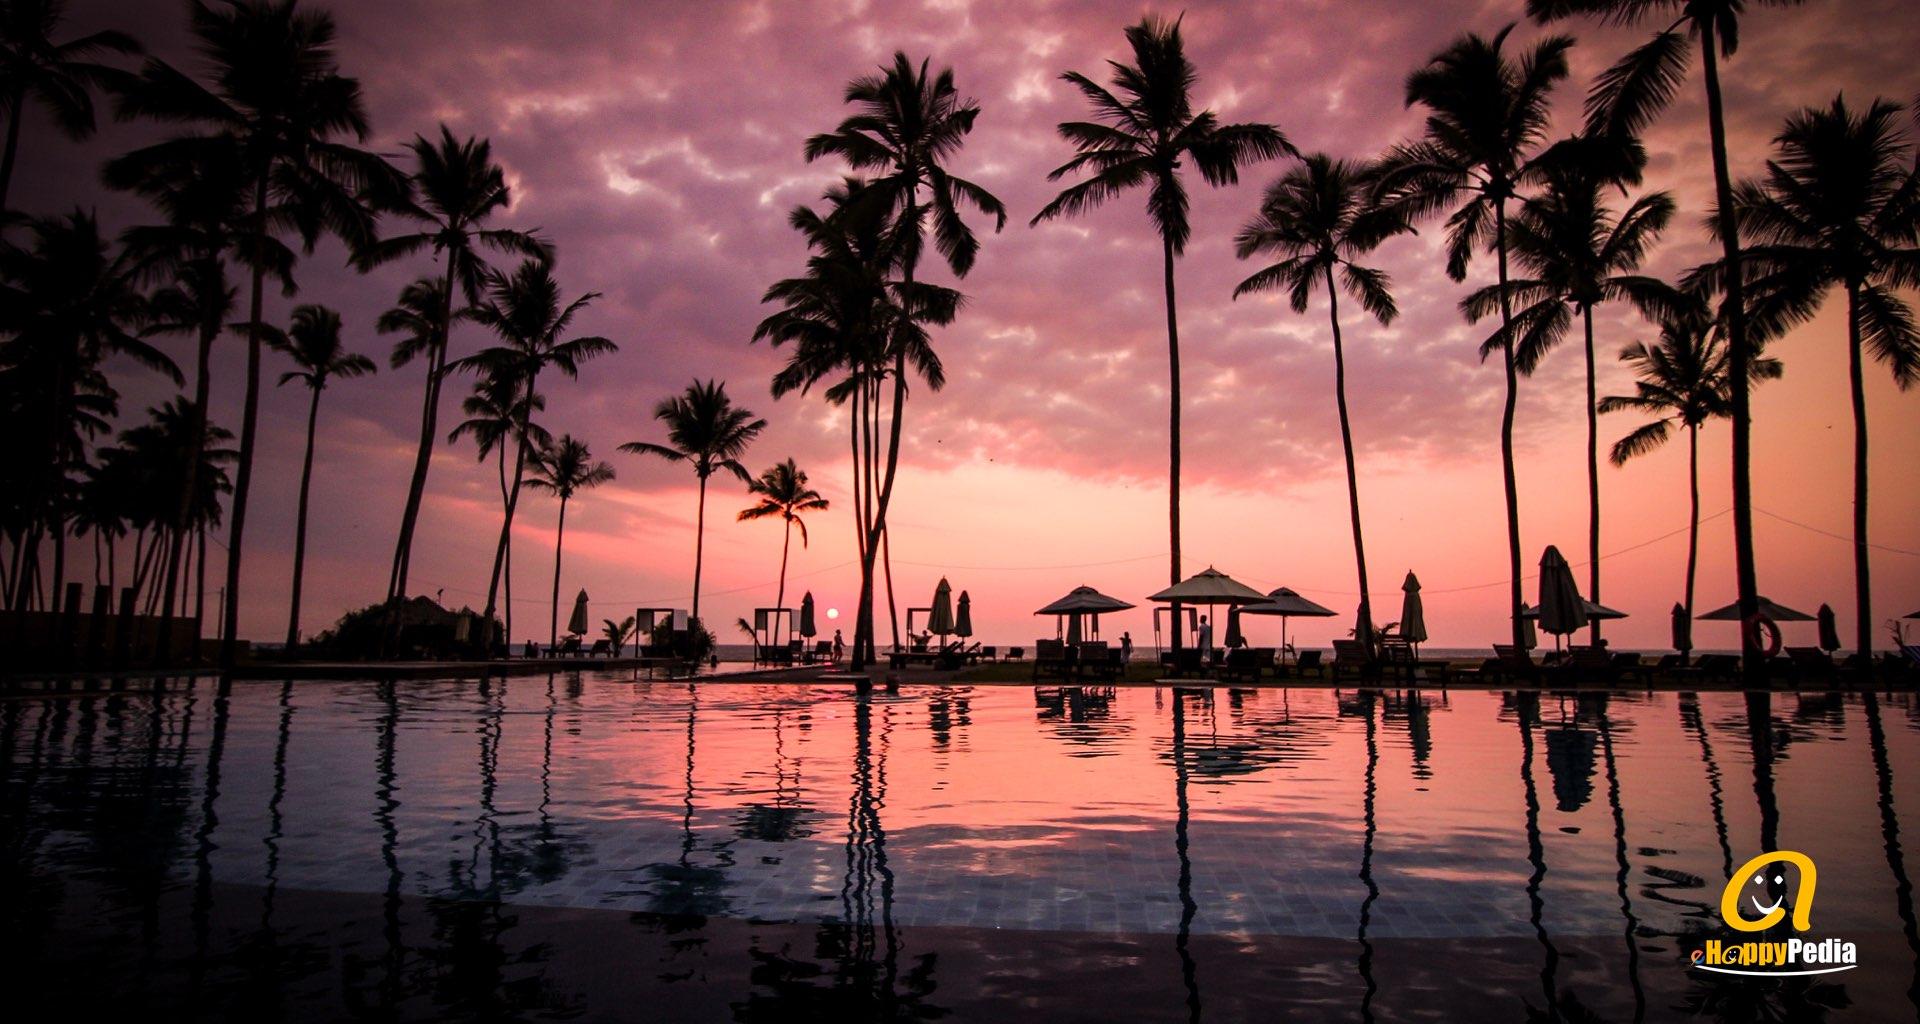 blog - sunset pool beach palm tree.jpeg